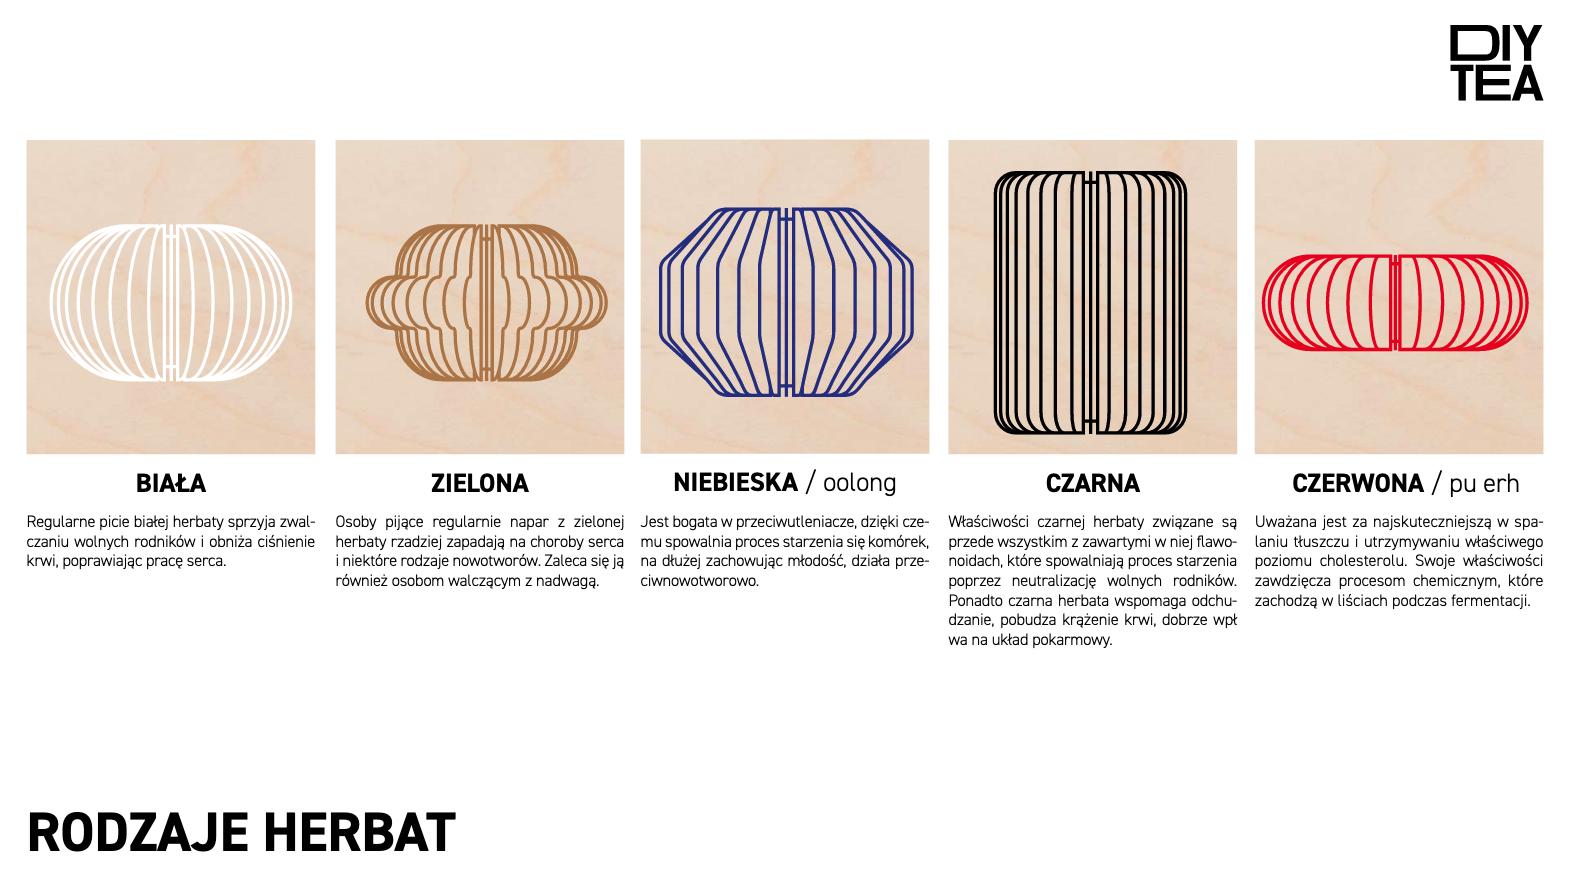 Nagroda Główna Polish Graphic Design Awards 2020